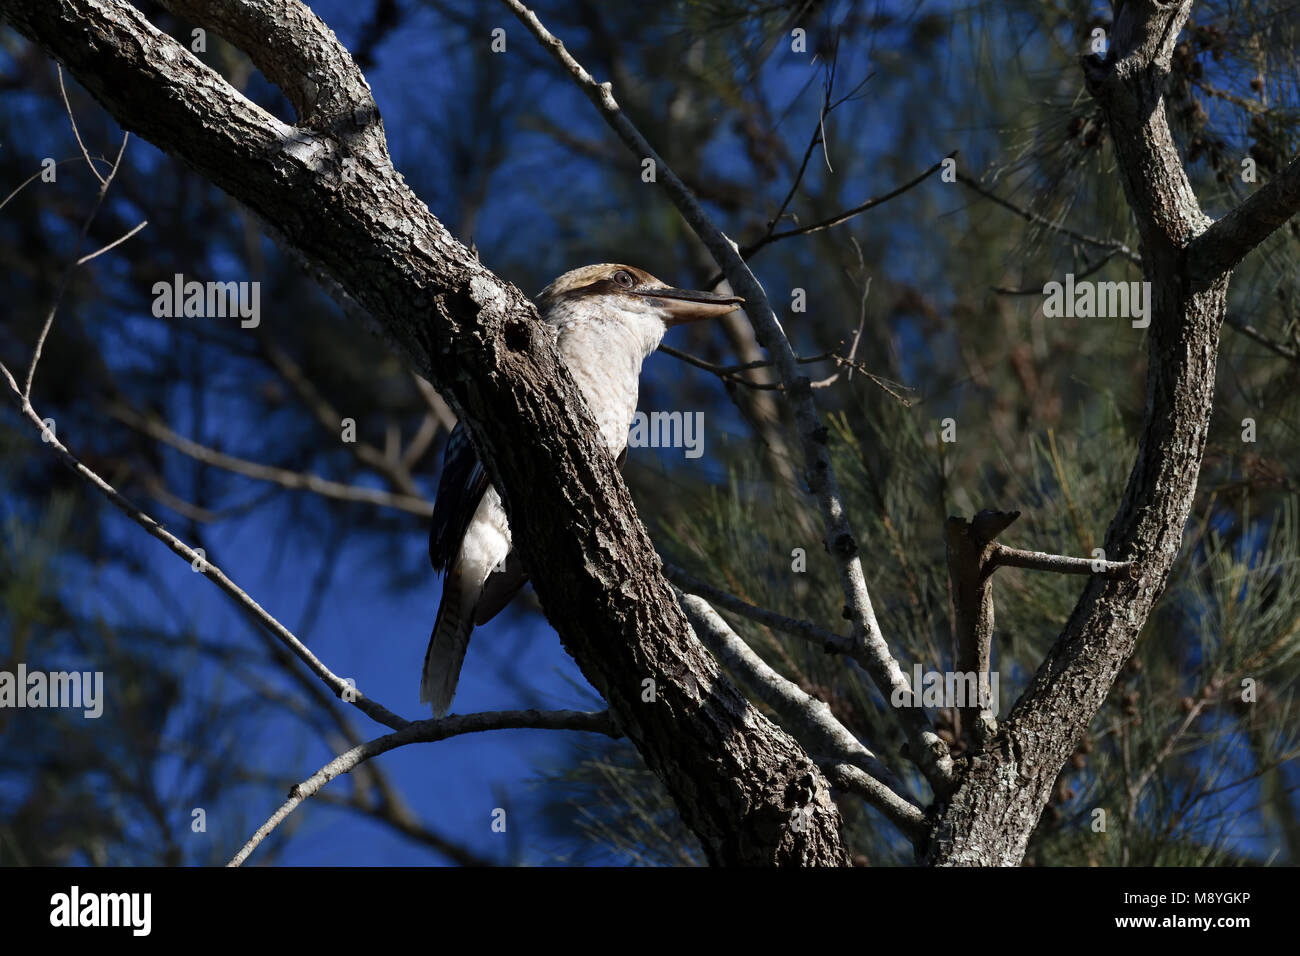 An Australian, Queensland Laughing Kookaburra, Dacelo novaeguineae resting on a Tree branch - Stock Image